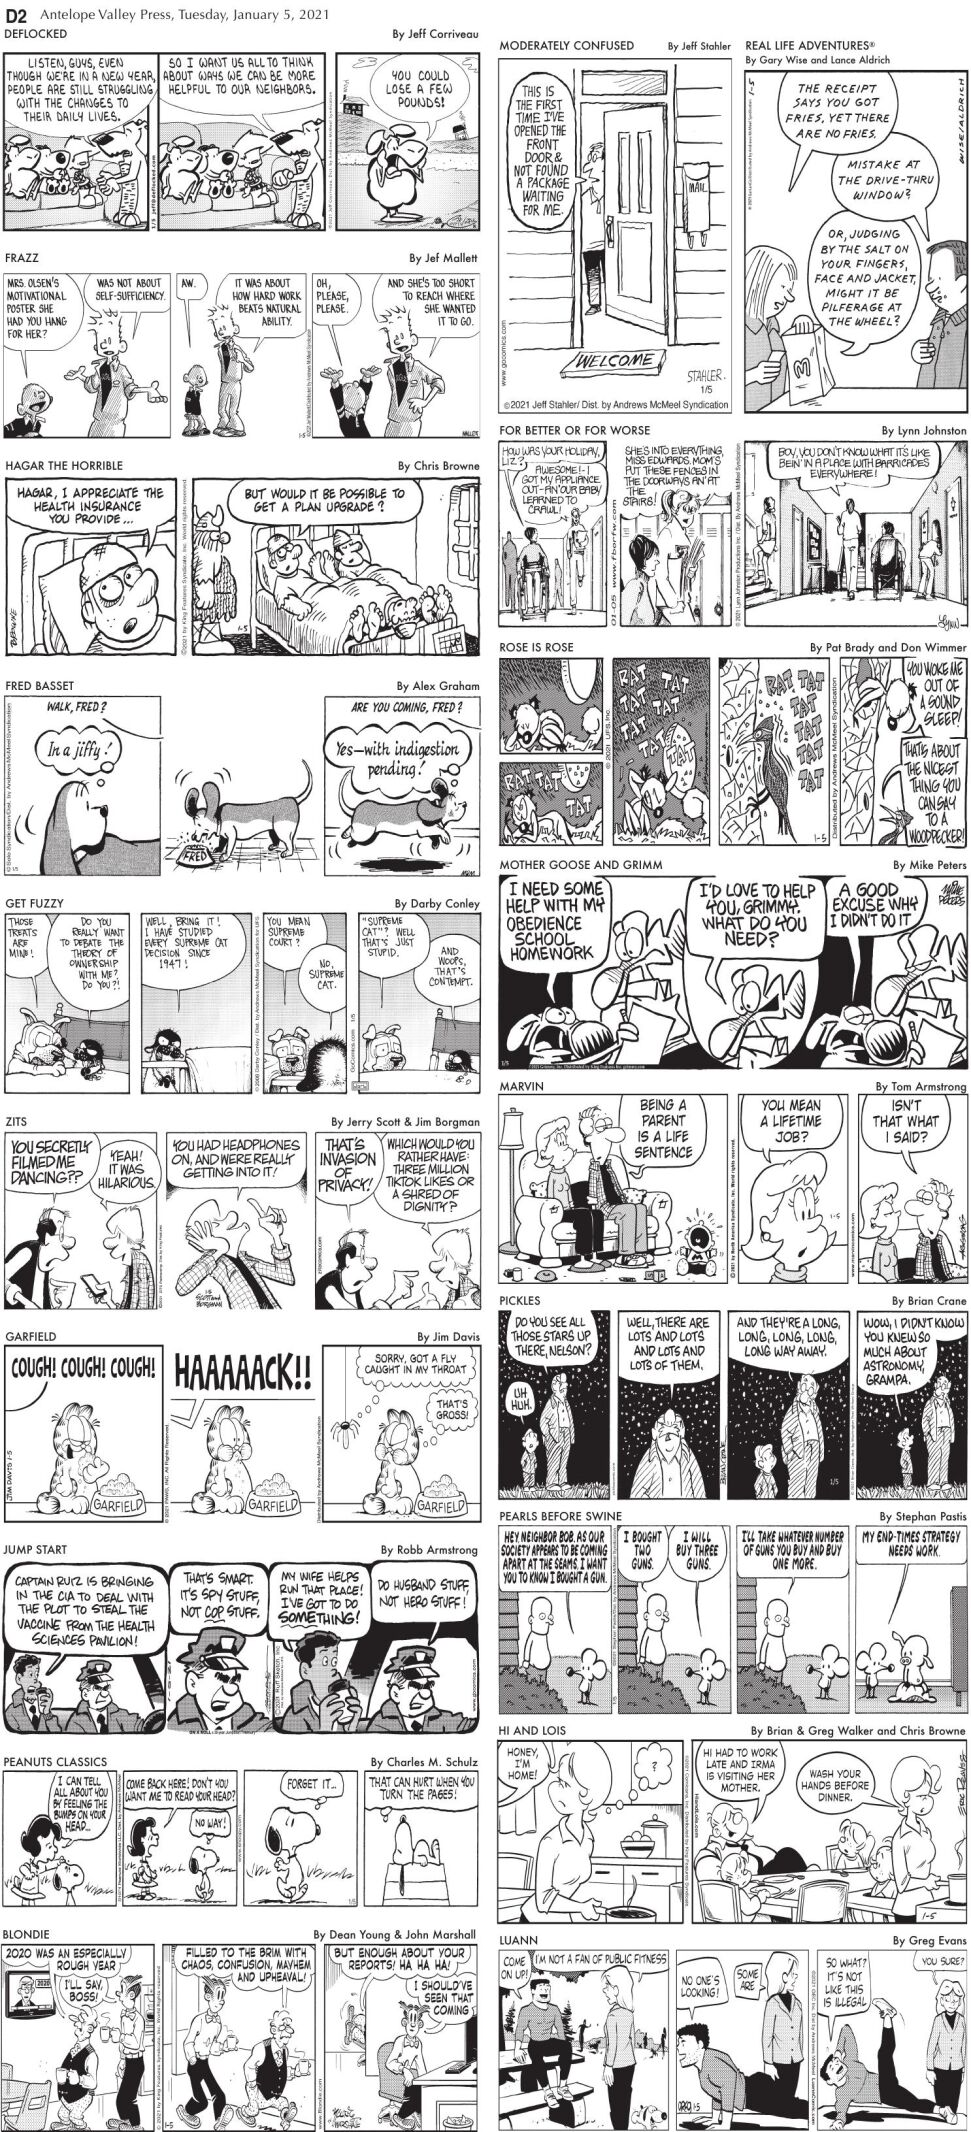 Comics, Jan. 5, 2020